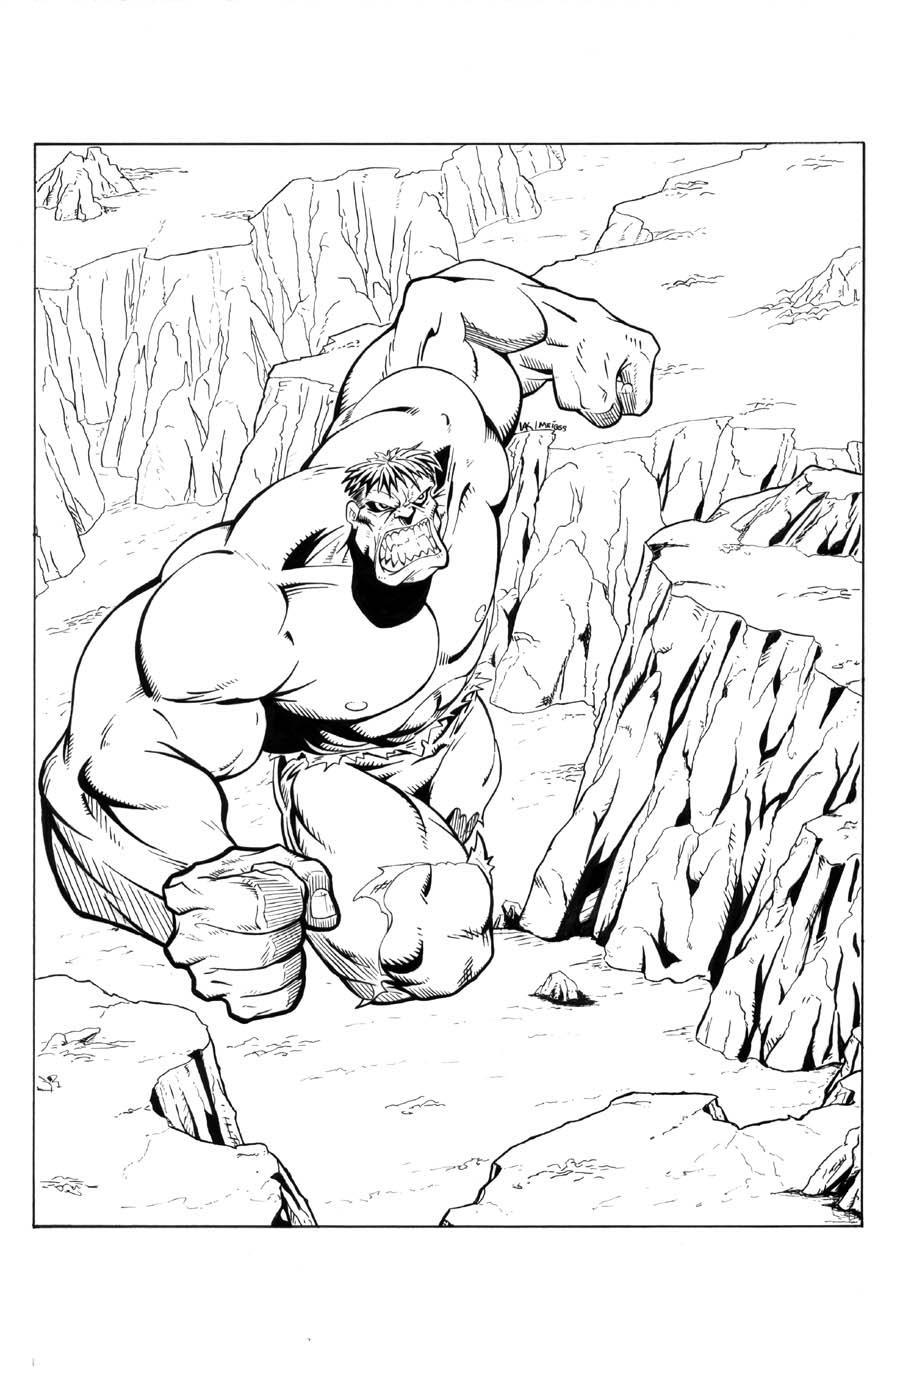 Hulk inked once again by billmeiggs